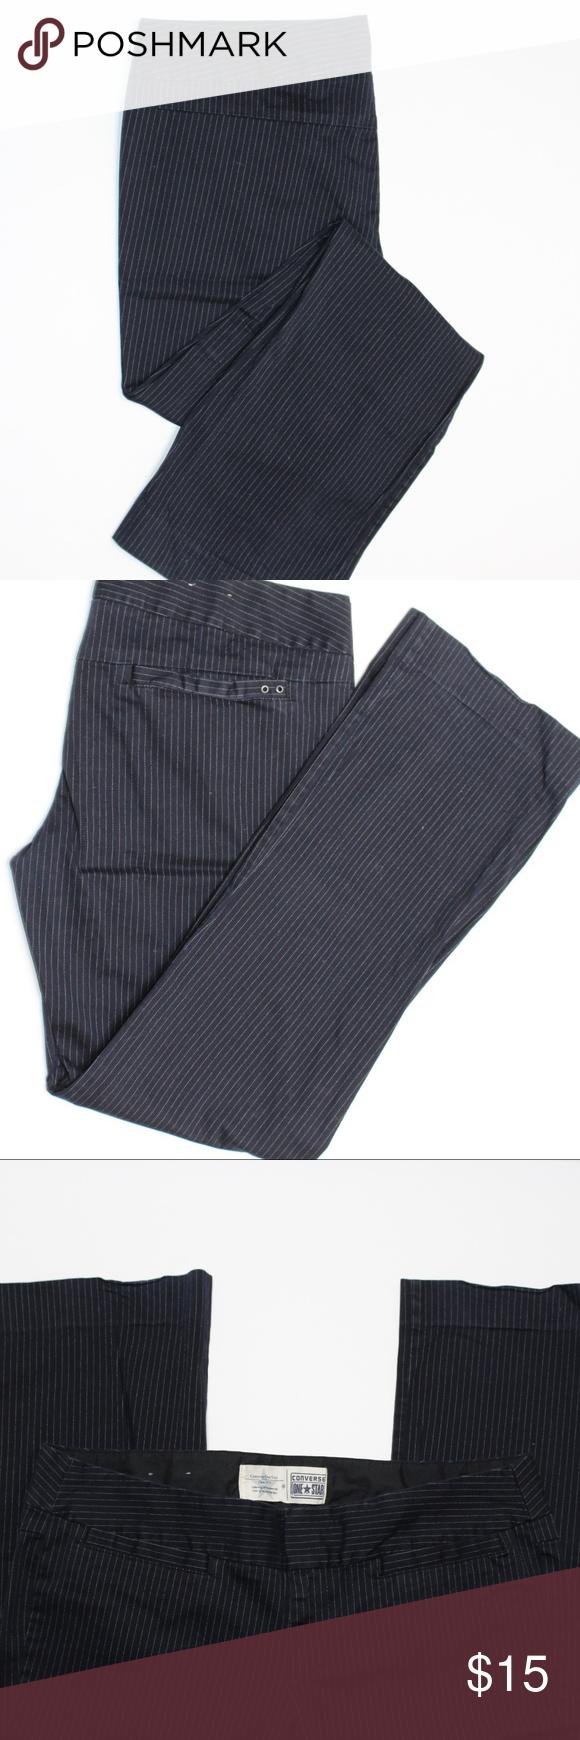 CONVERSE ONE STAR Women Pants Size 14